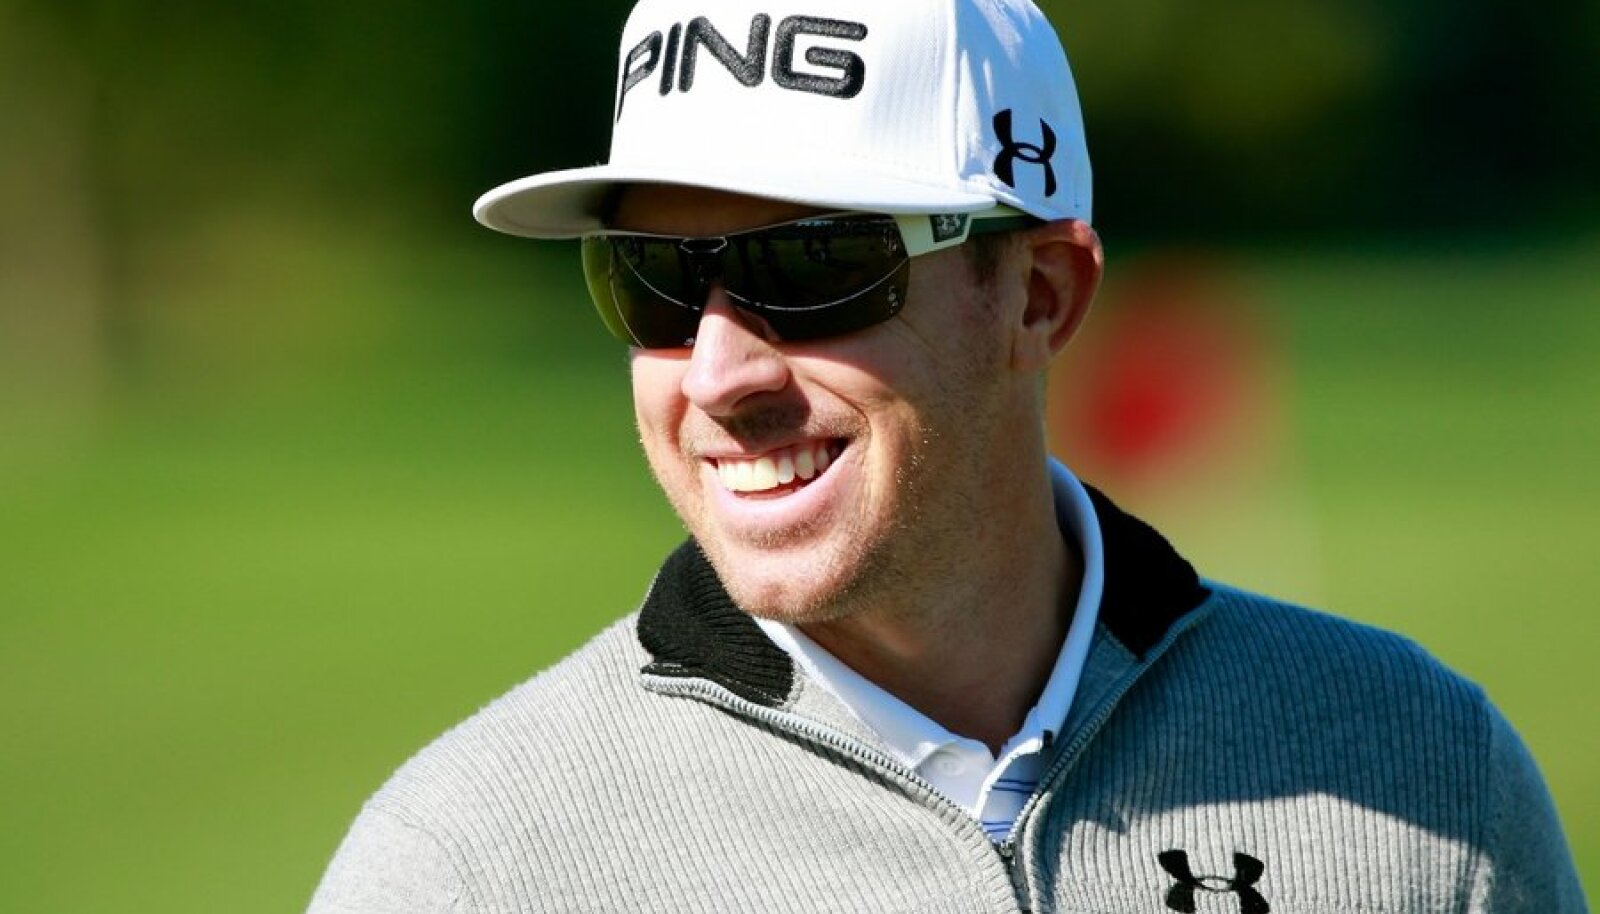 Hunter Mahan lõi tippturniiril hole-in-one´i, golf